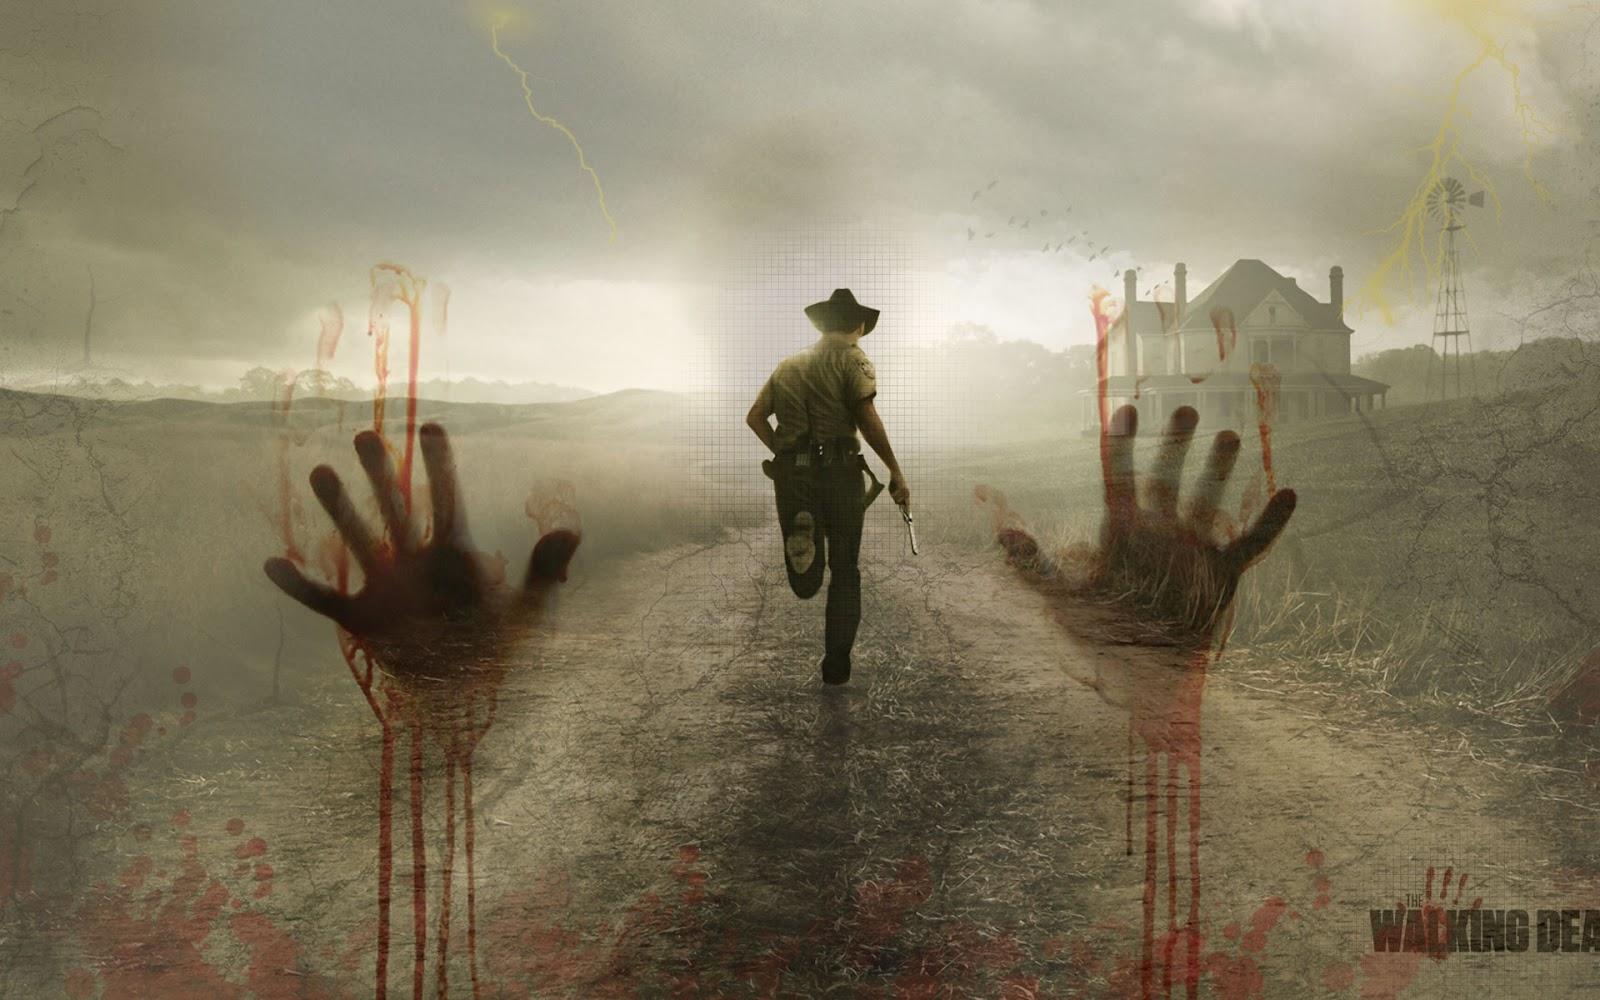 http://dissenttheblog.blogspot.com/2013/09/the-walking-dead.html